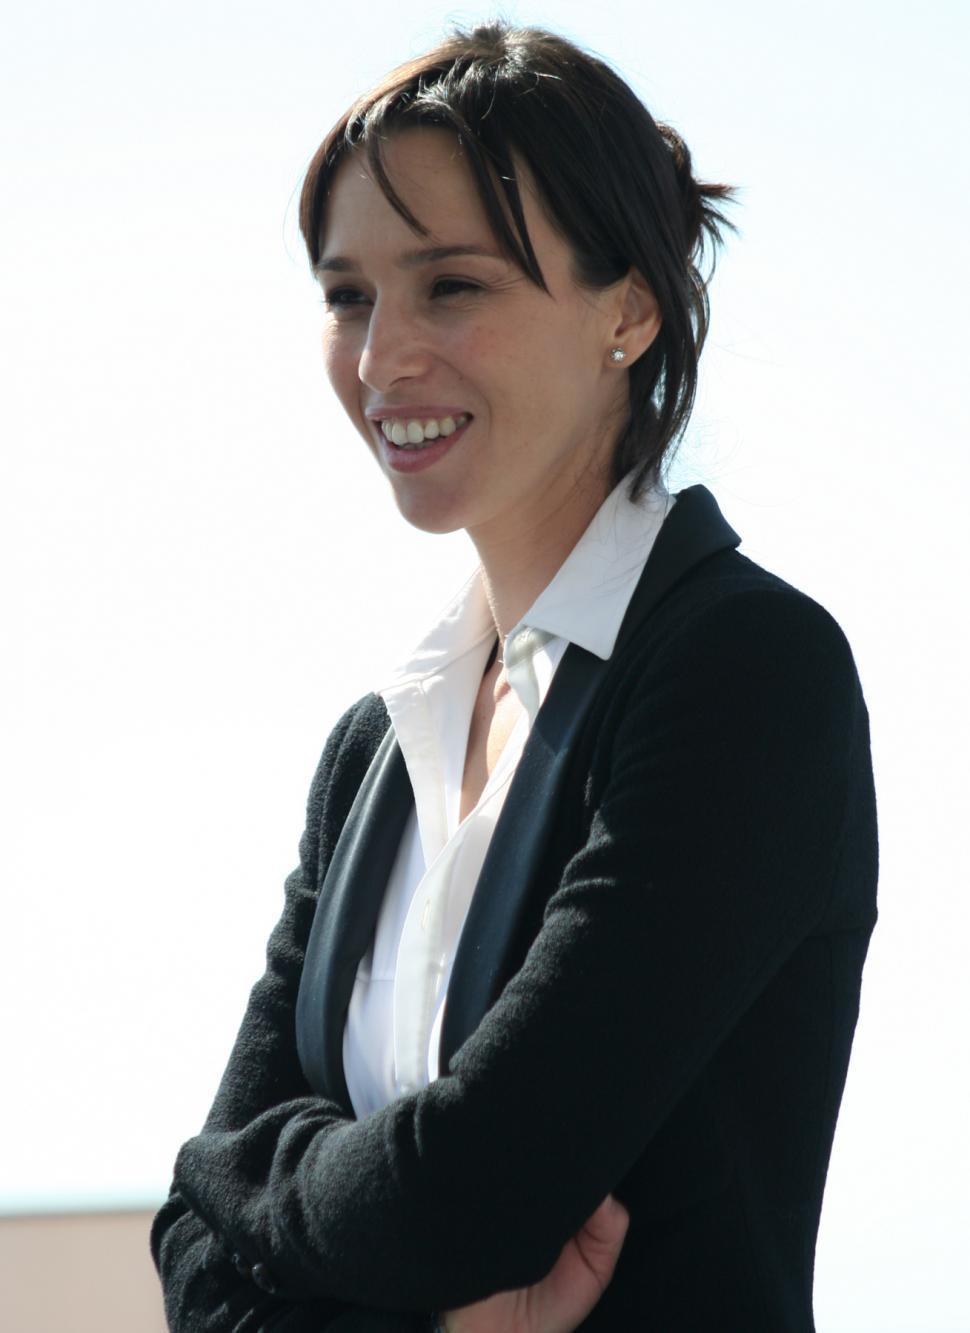 Ariadna Gil